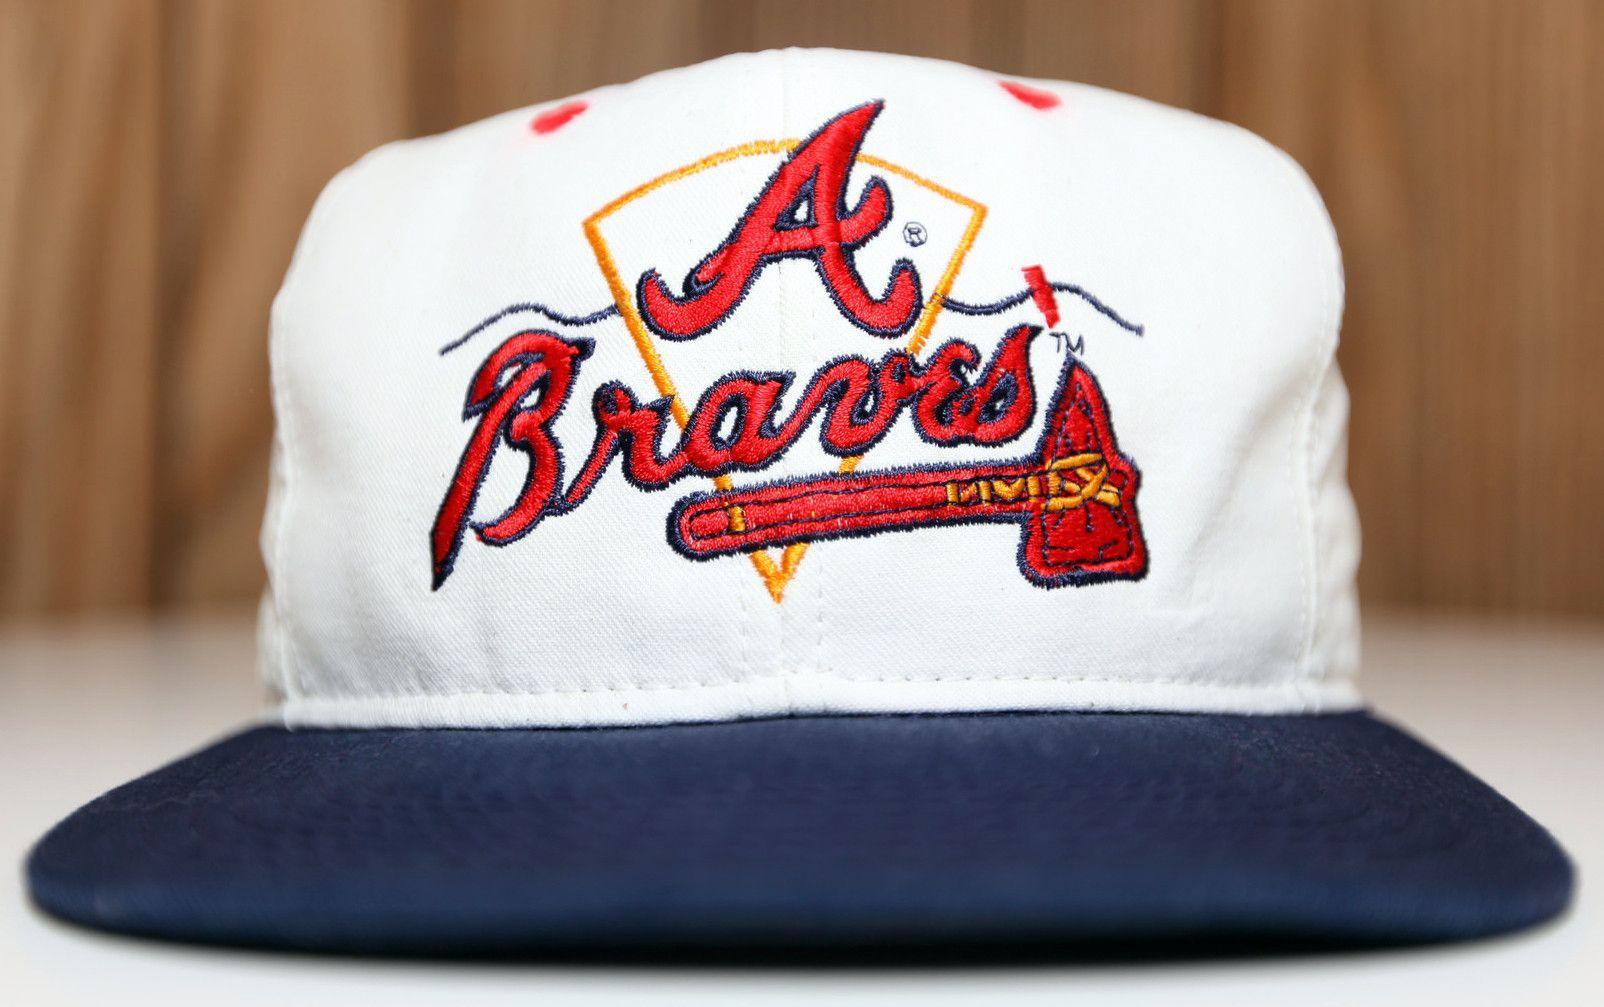 Sonny Buffalo Atlanta Braves Hat Braves Hat Atlanta Braves